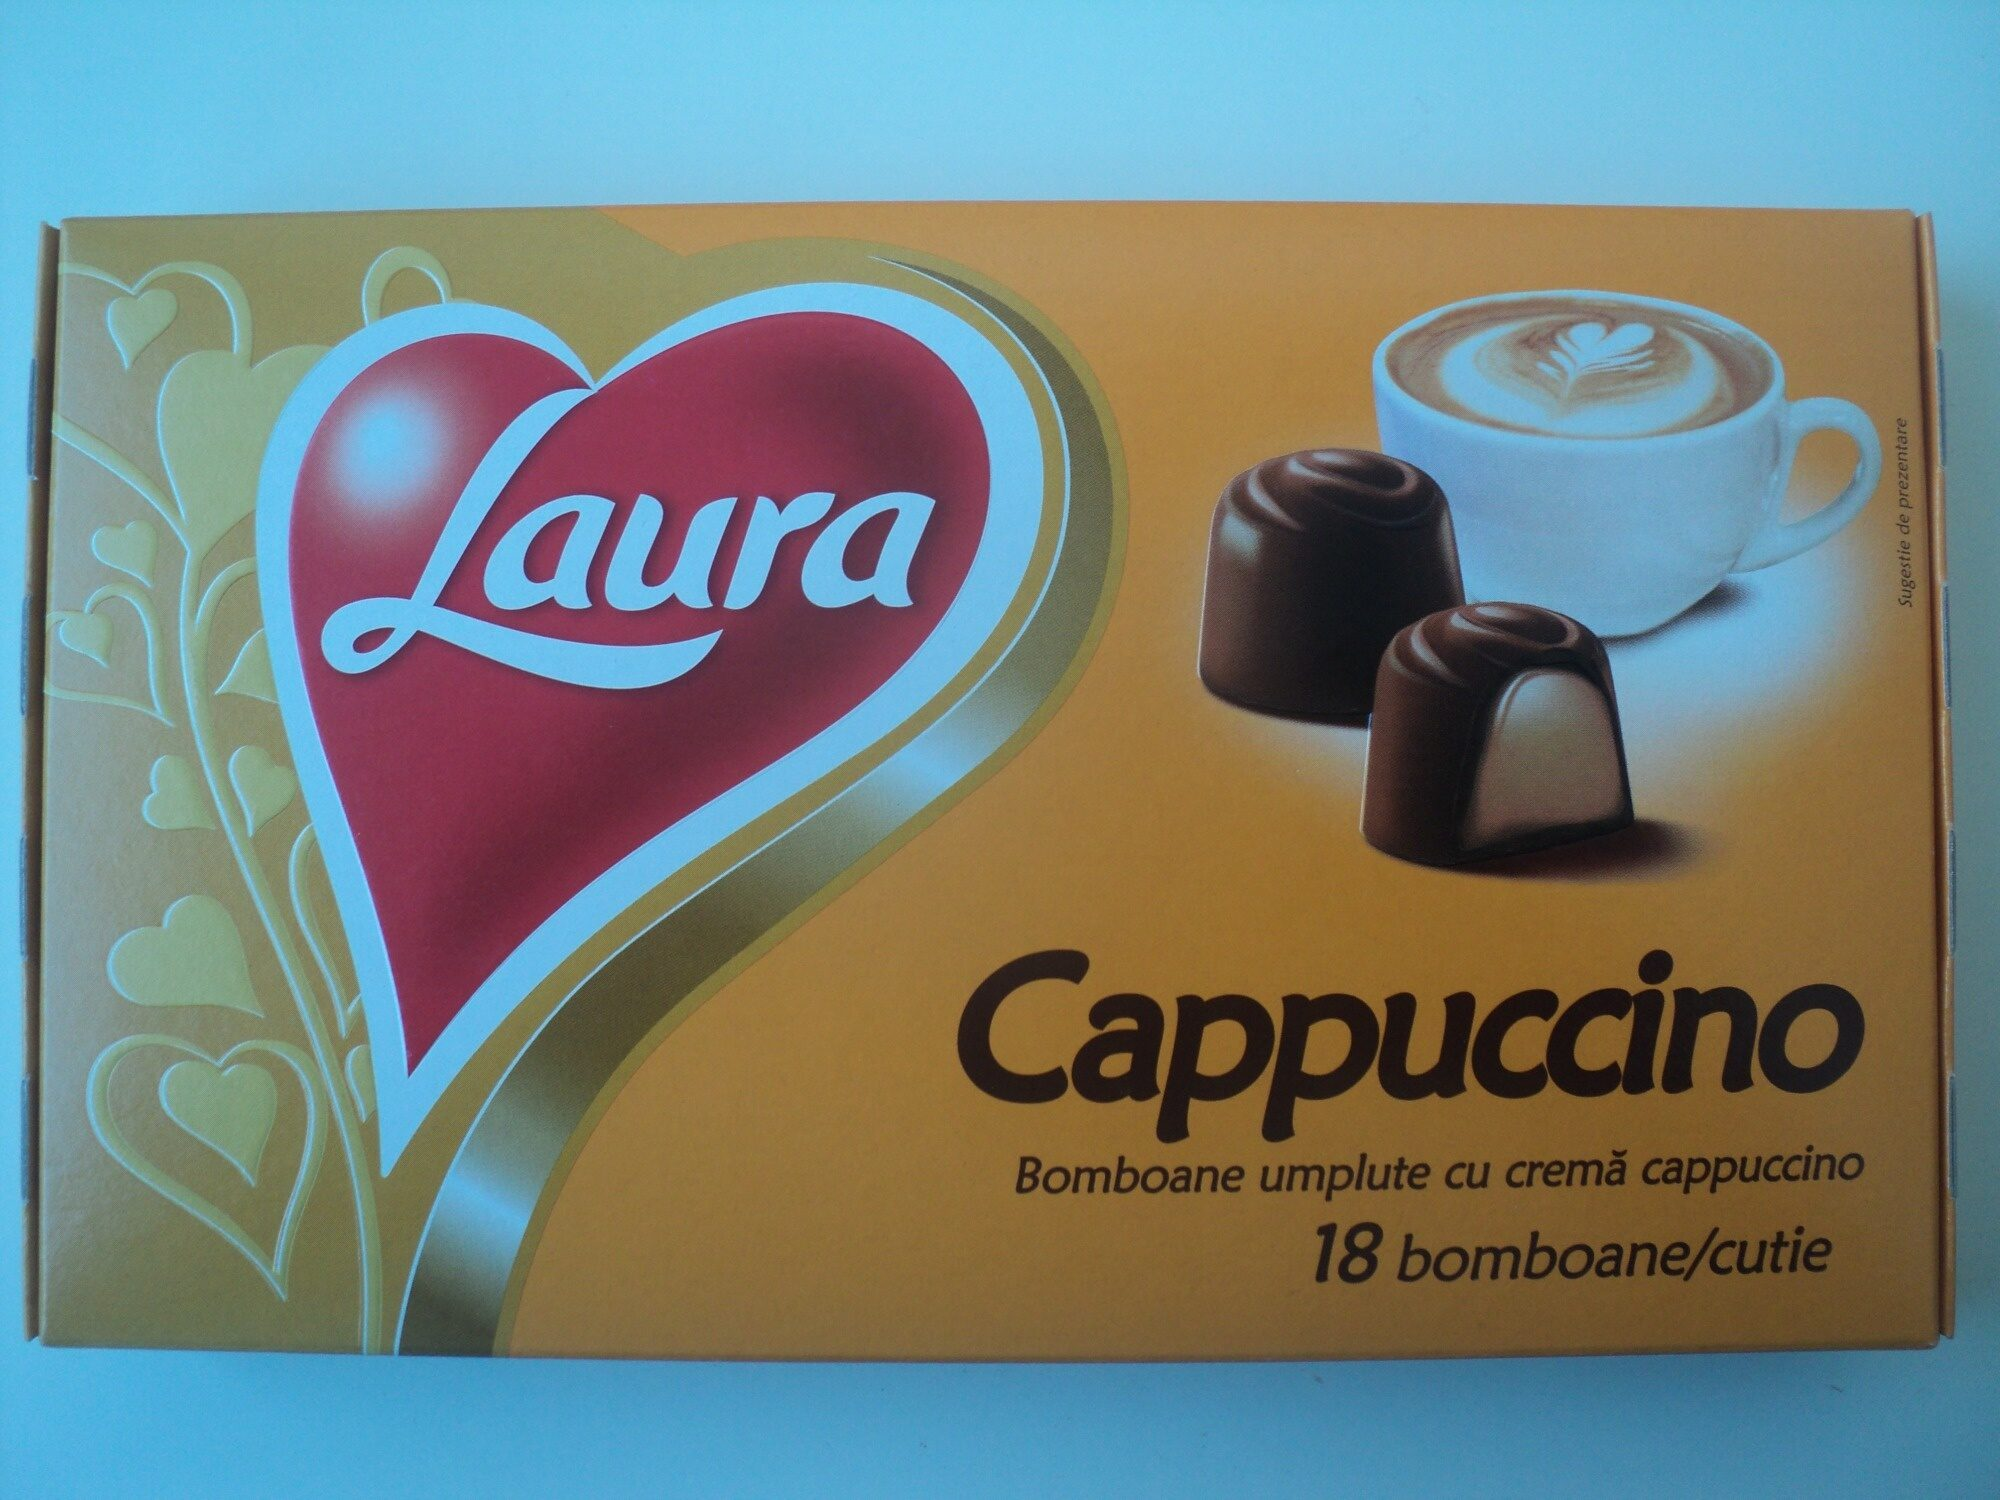 Bomboane cu cremă cappuccino - Producto - ro